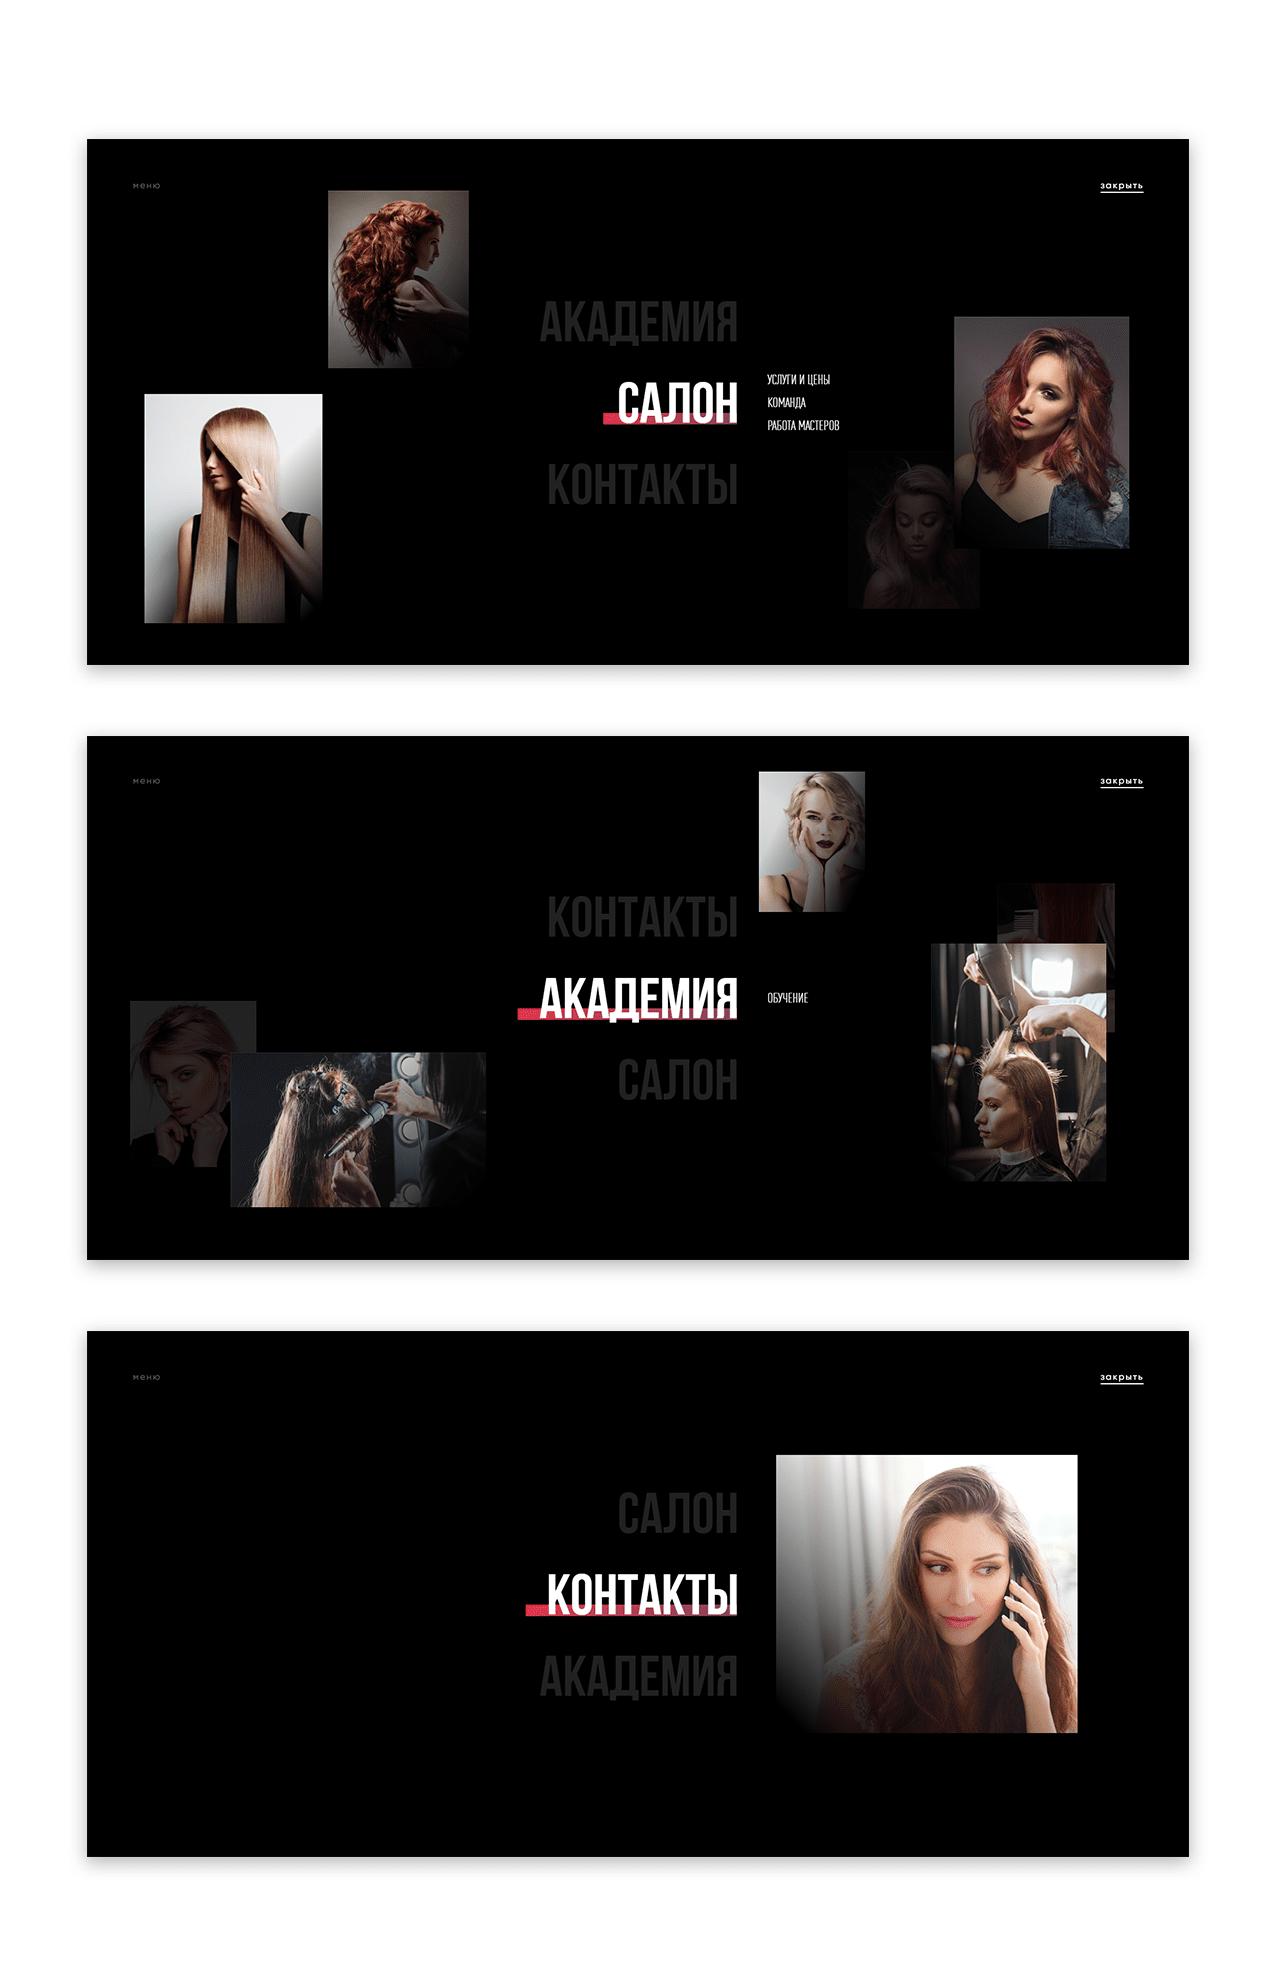 Avalon website development menu